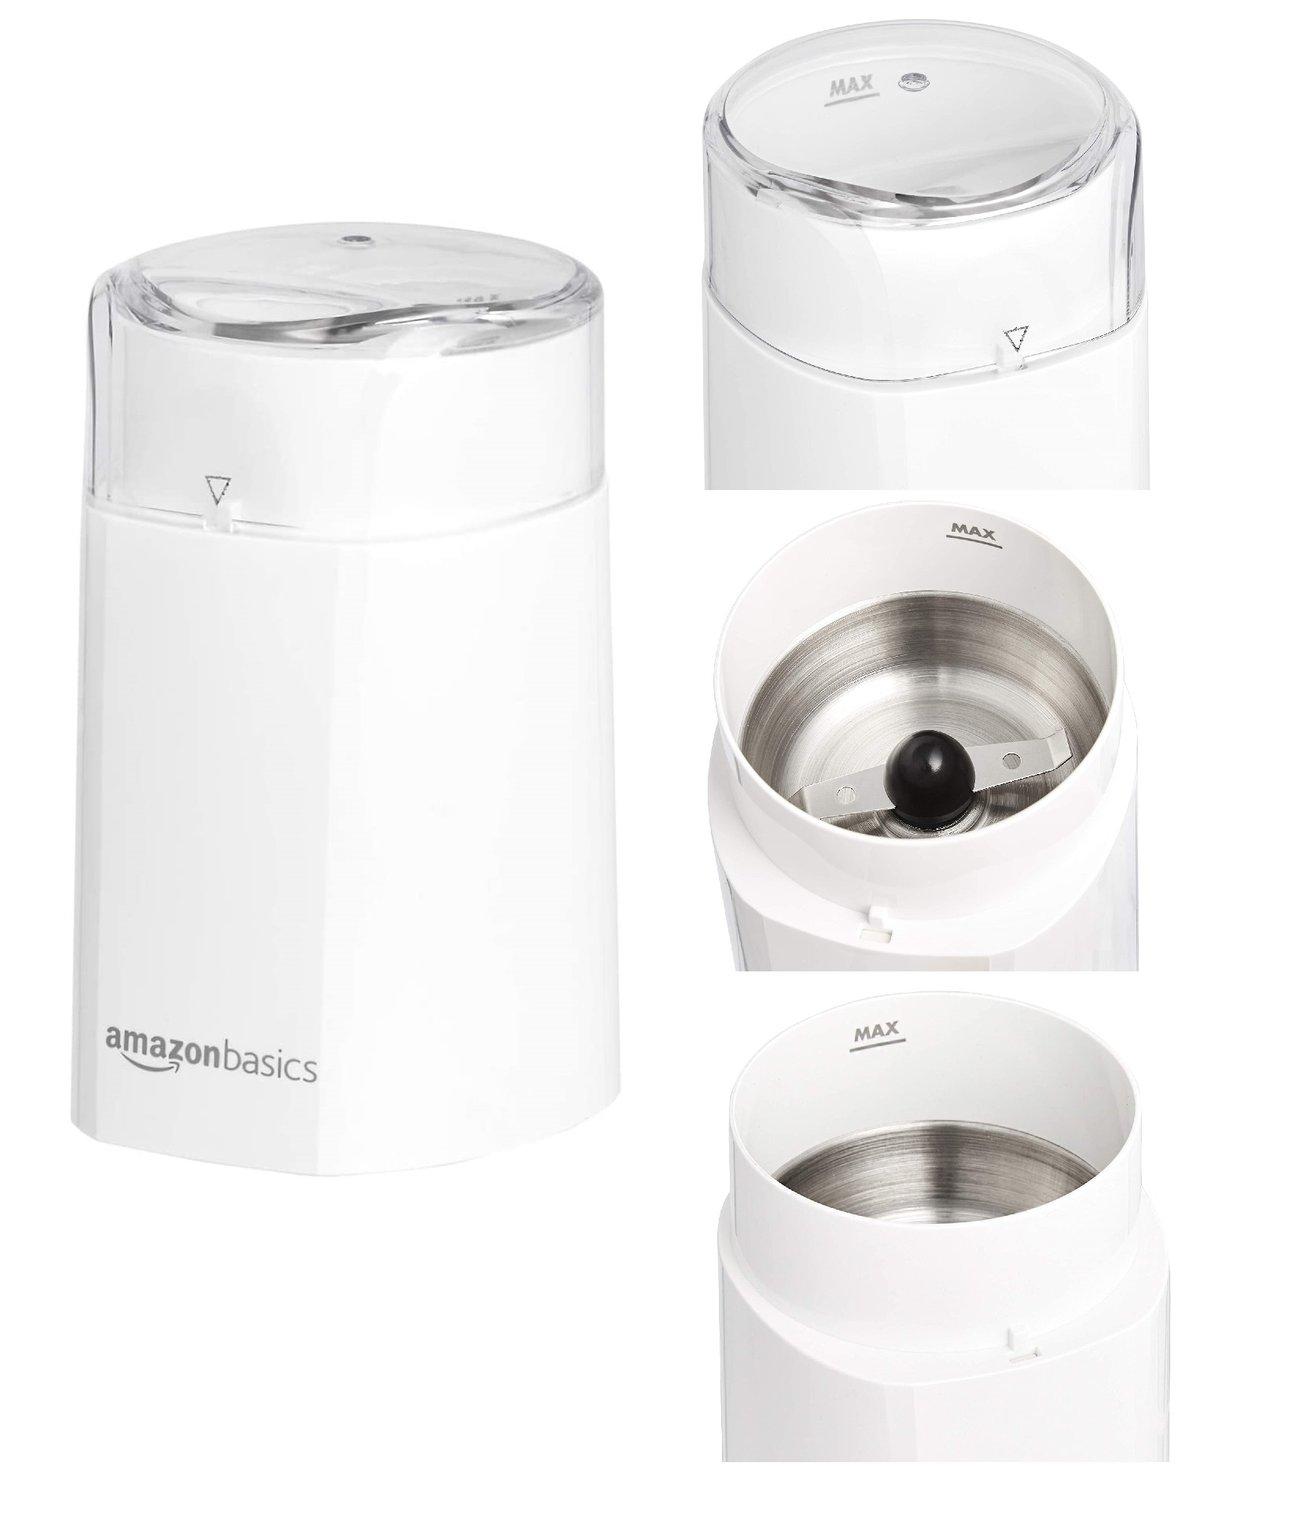 Кафемелачка Amazon Basics CG9403-GS-W 150W ел мелница за кафе подправки